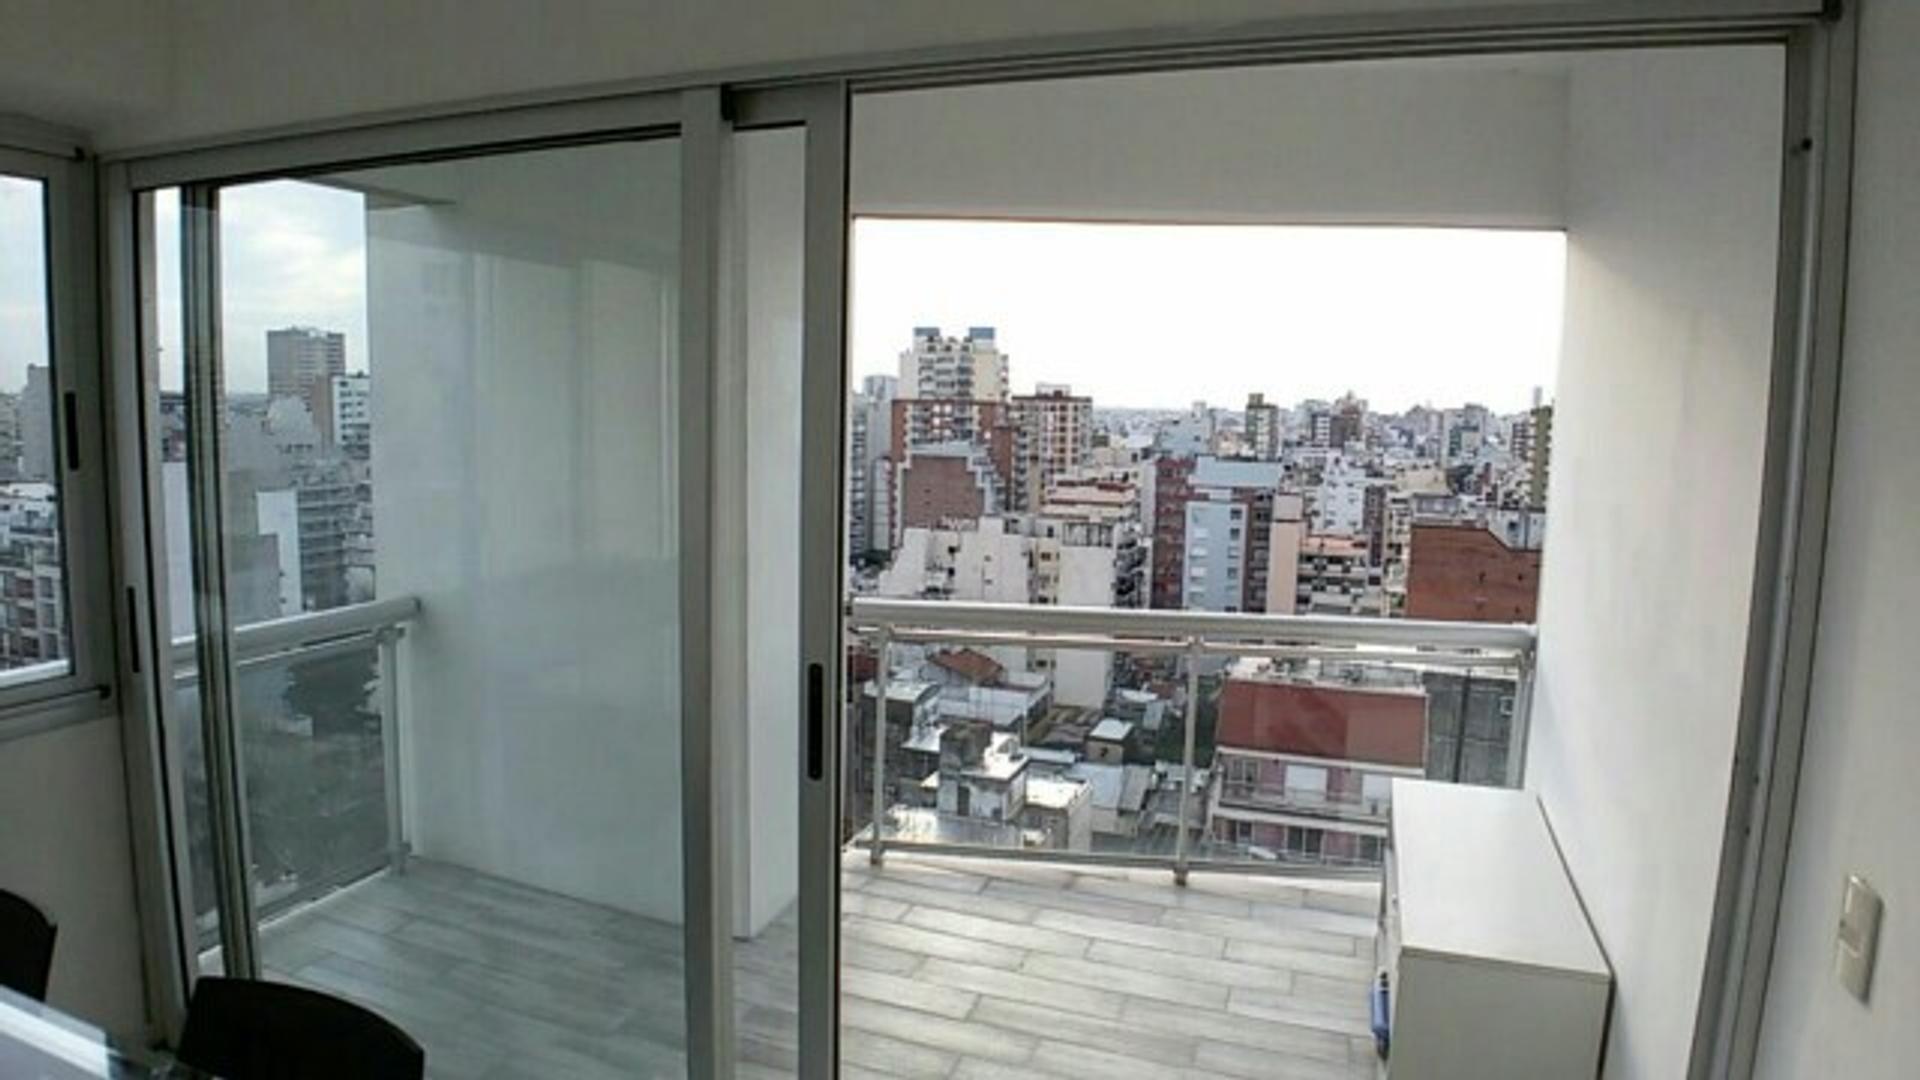 XINTEL(MPR-MPR-548) Departamento - Venta - Argentina, Capital Federal - AMENABAR 2300